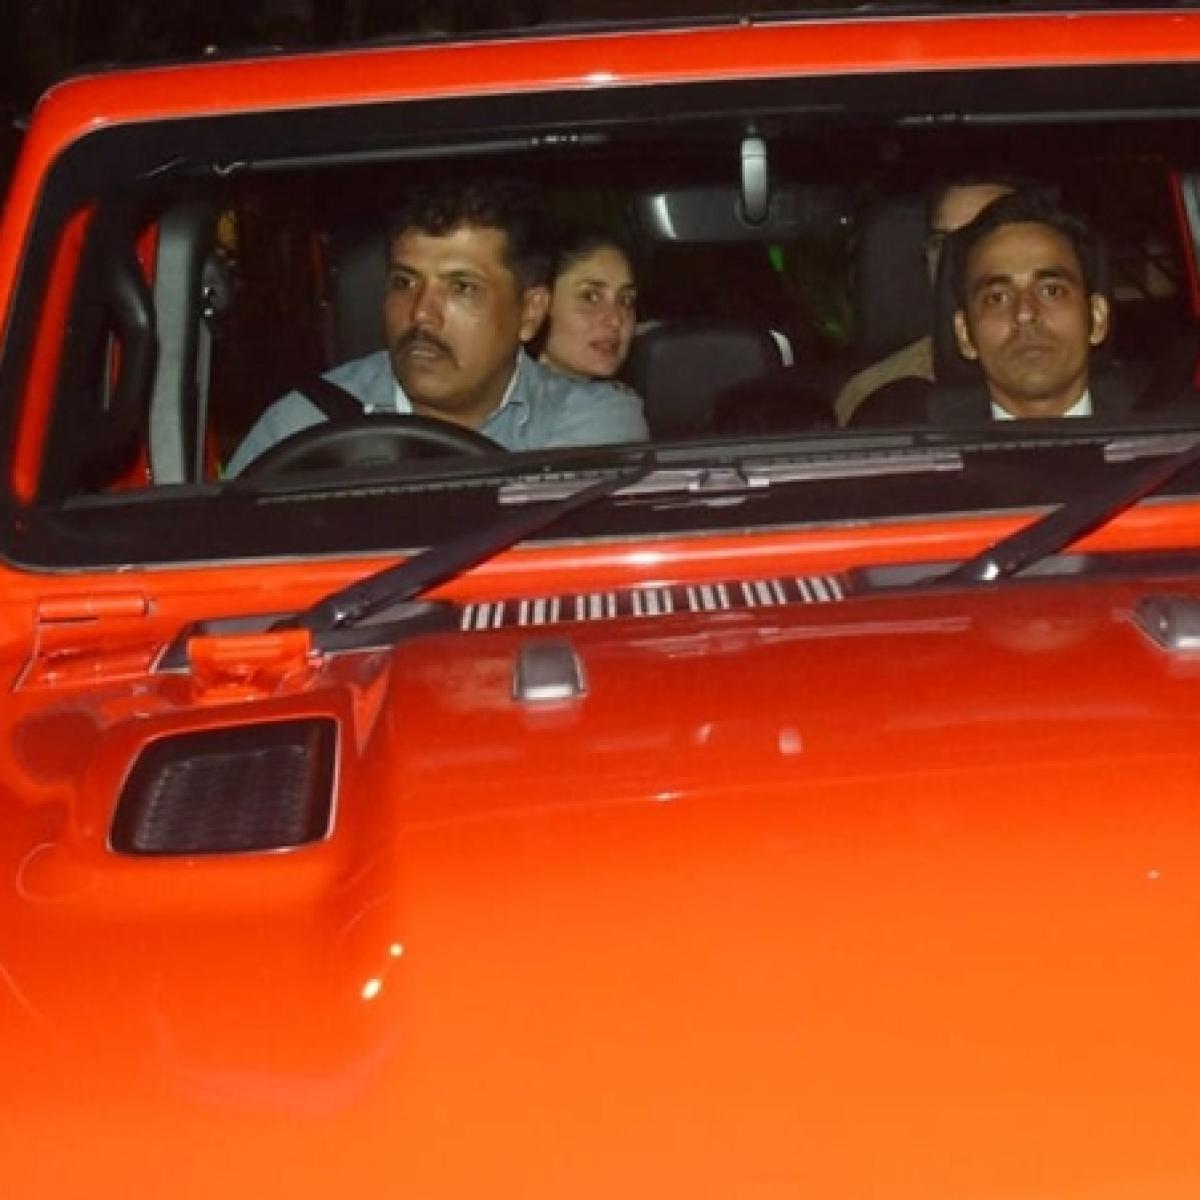 Saif Ali Khan, Kareena Kapoor's stylish Jeep comes at a mammoth price of Rs 75 lakh!